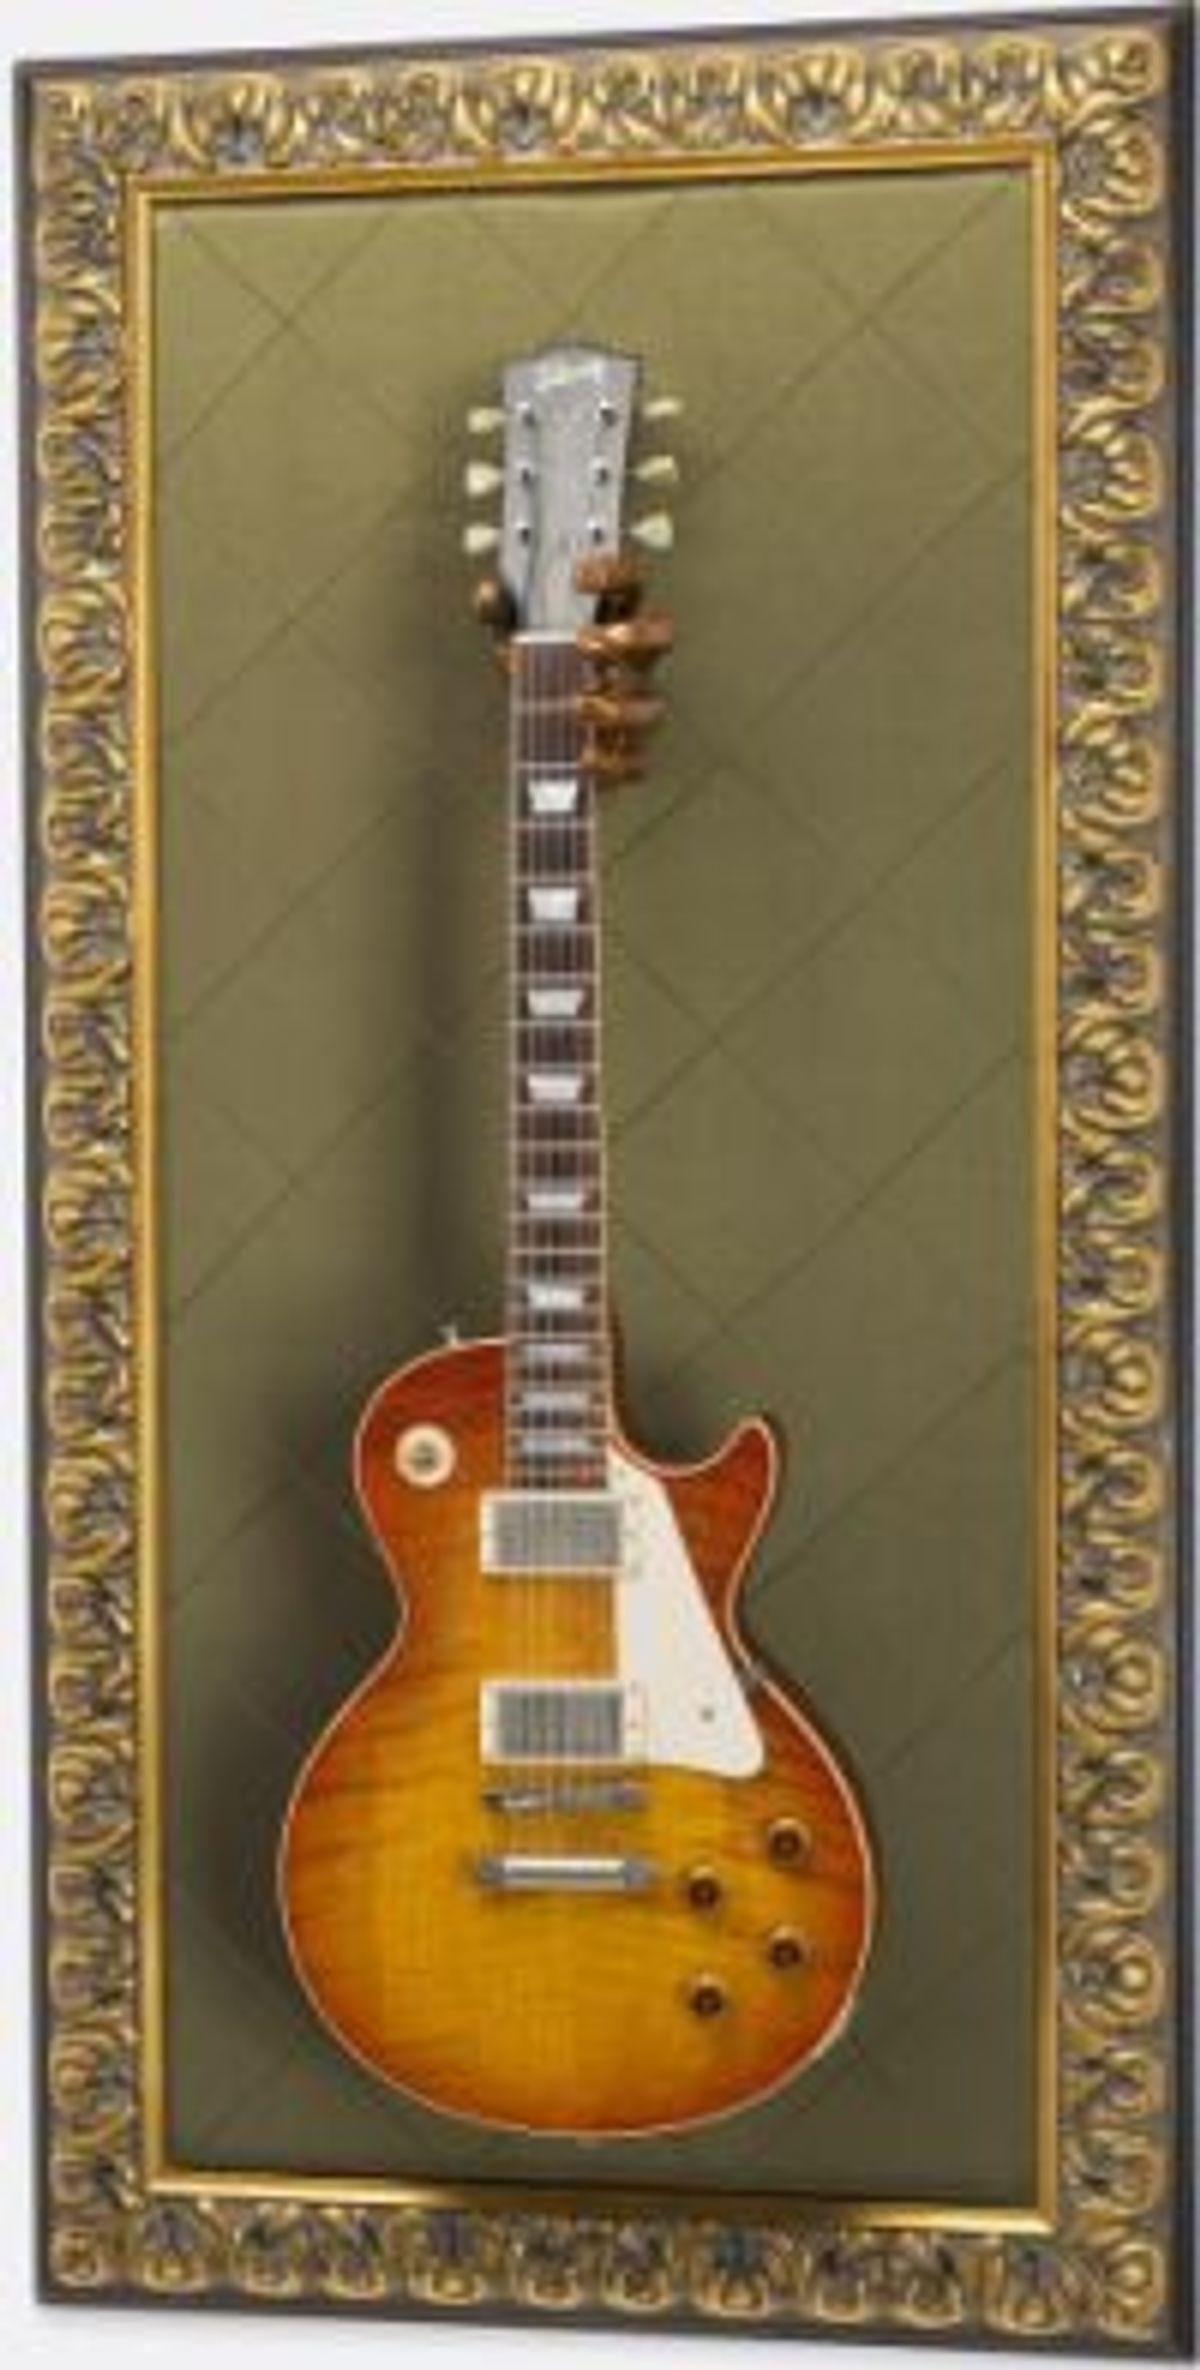 Hart Productions Announces the Guitar Frame